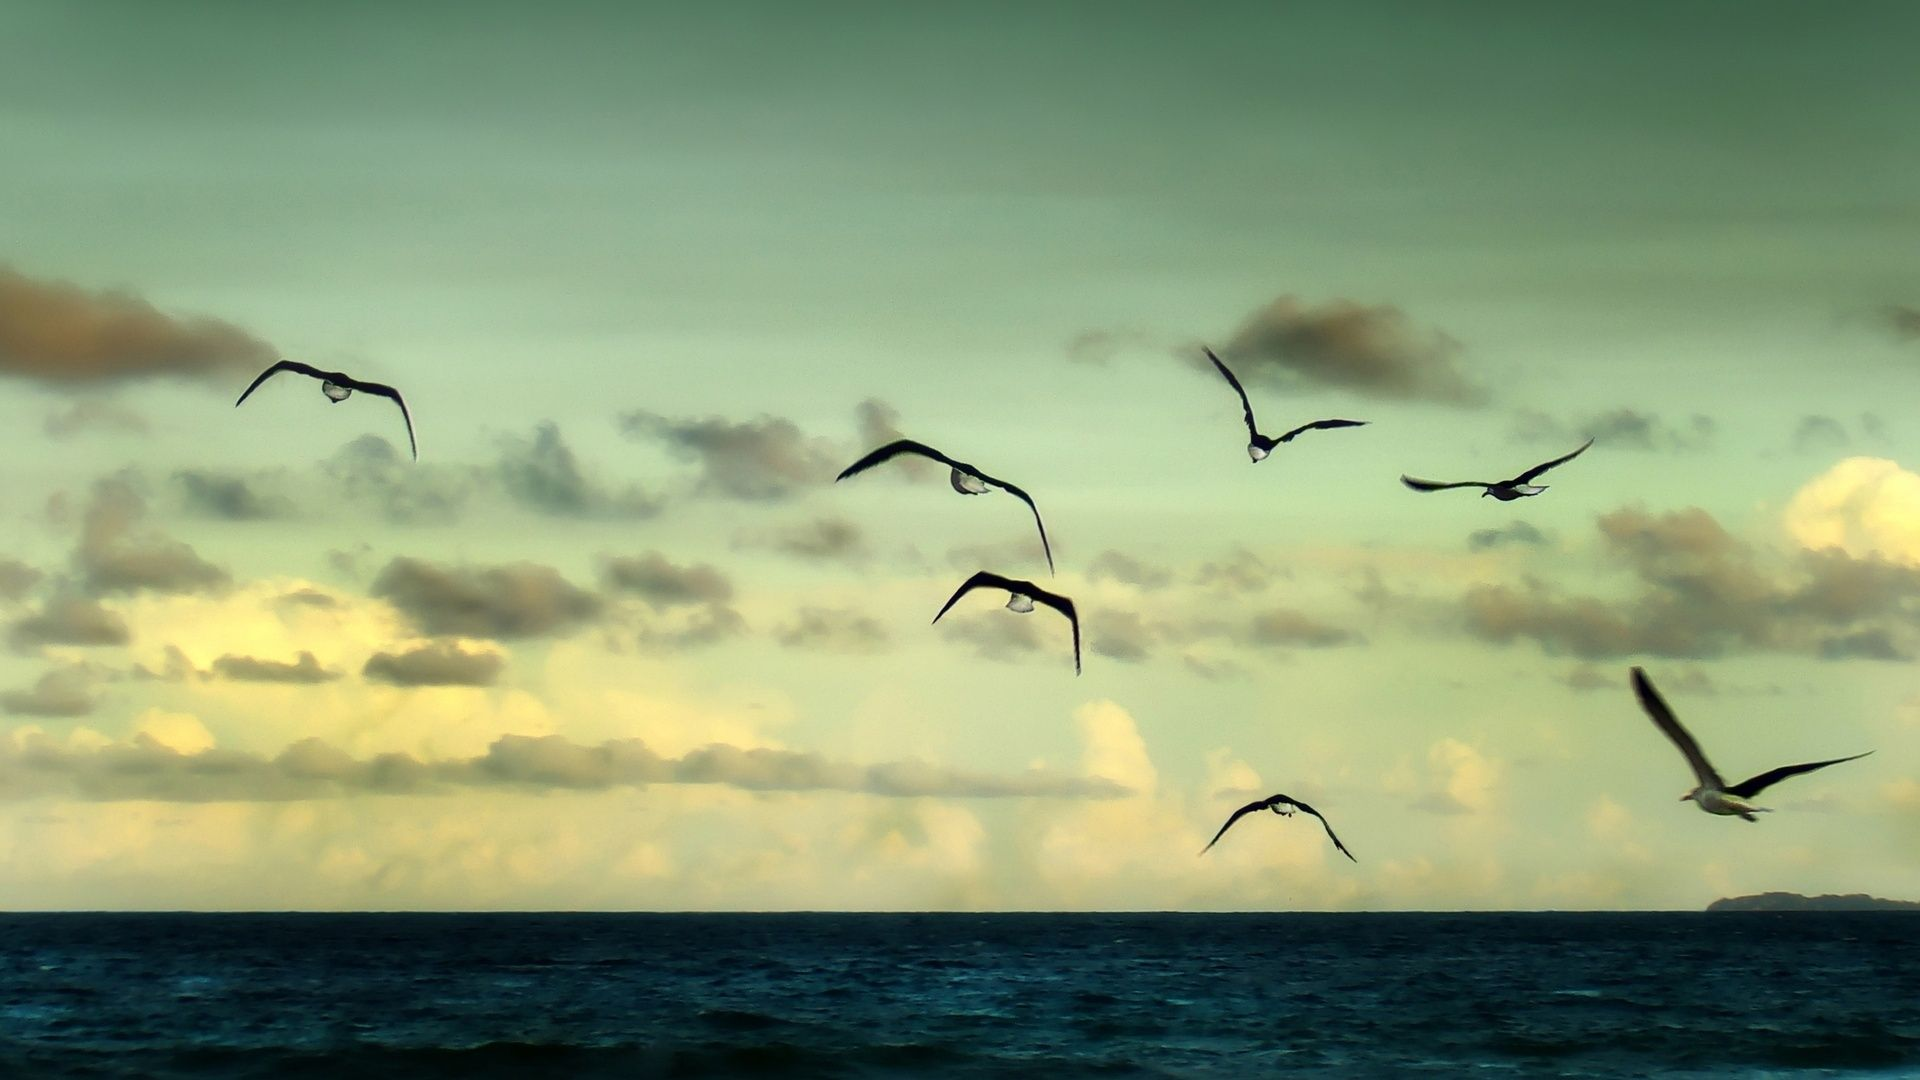 Seagull Sky Birds Hd Free Wallpapers 1080p Free Wallpaper Birds Sky